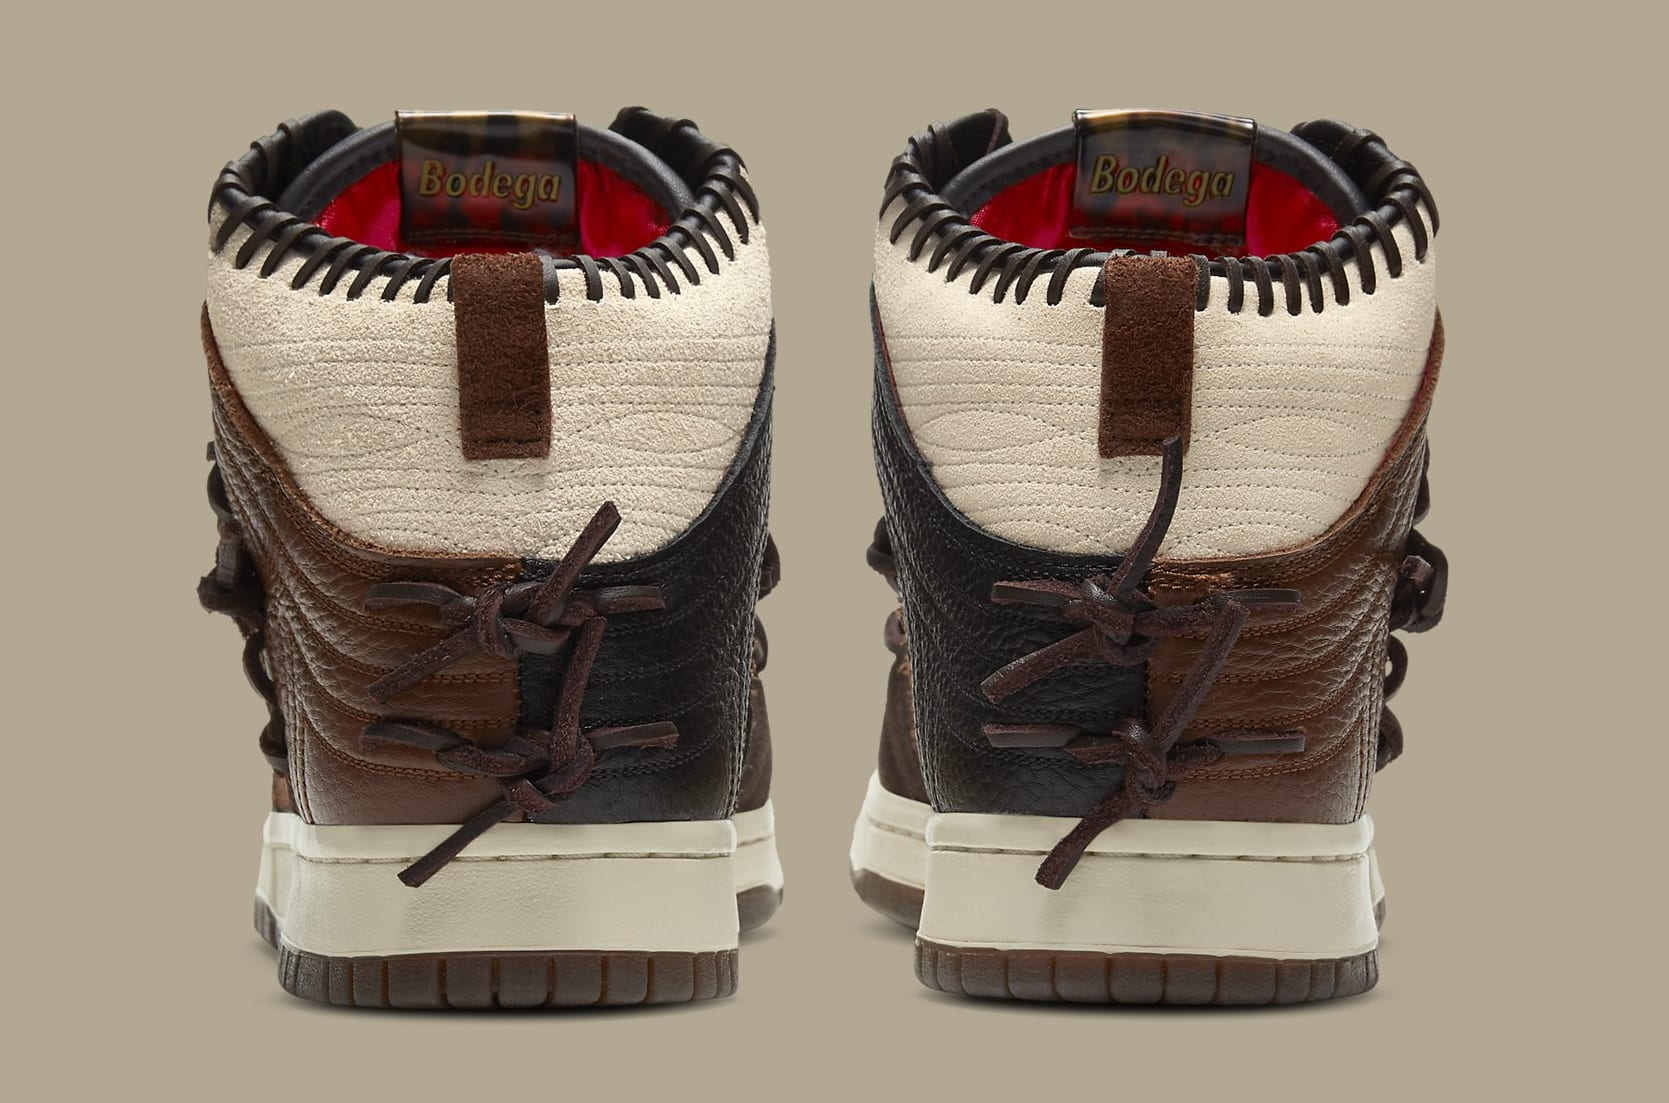 Bodega x Nike Dunk High CZ8125-200 Heel